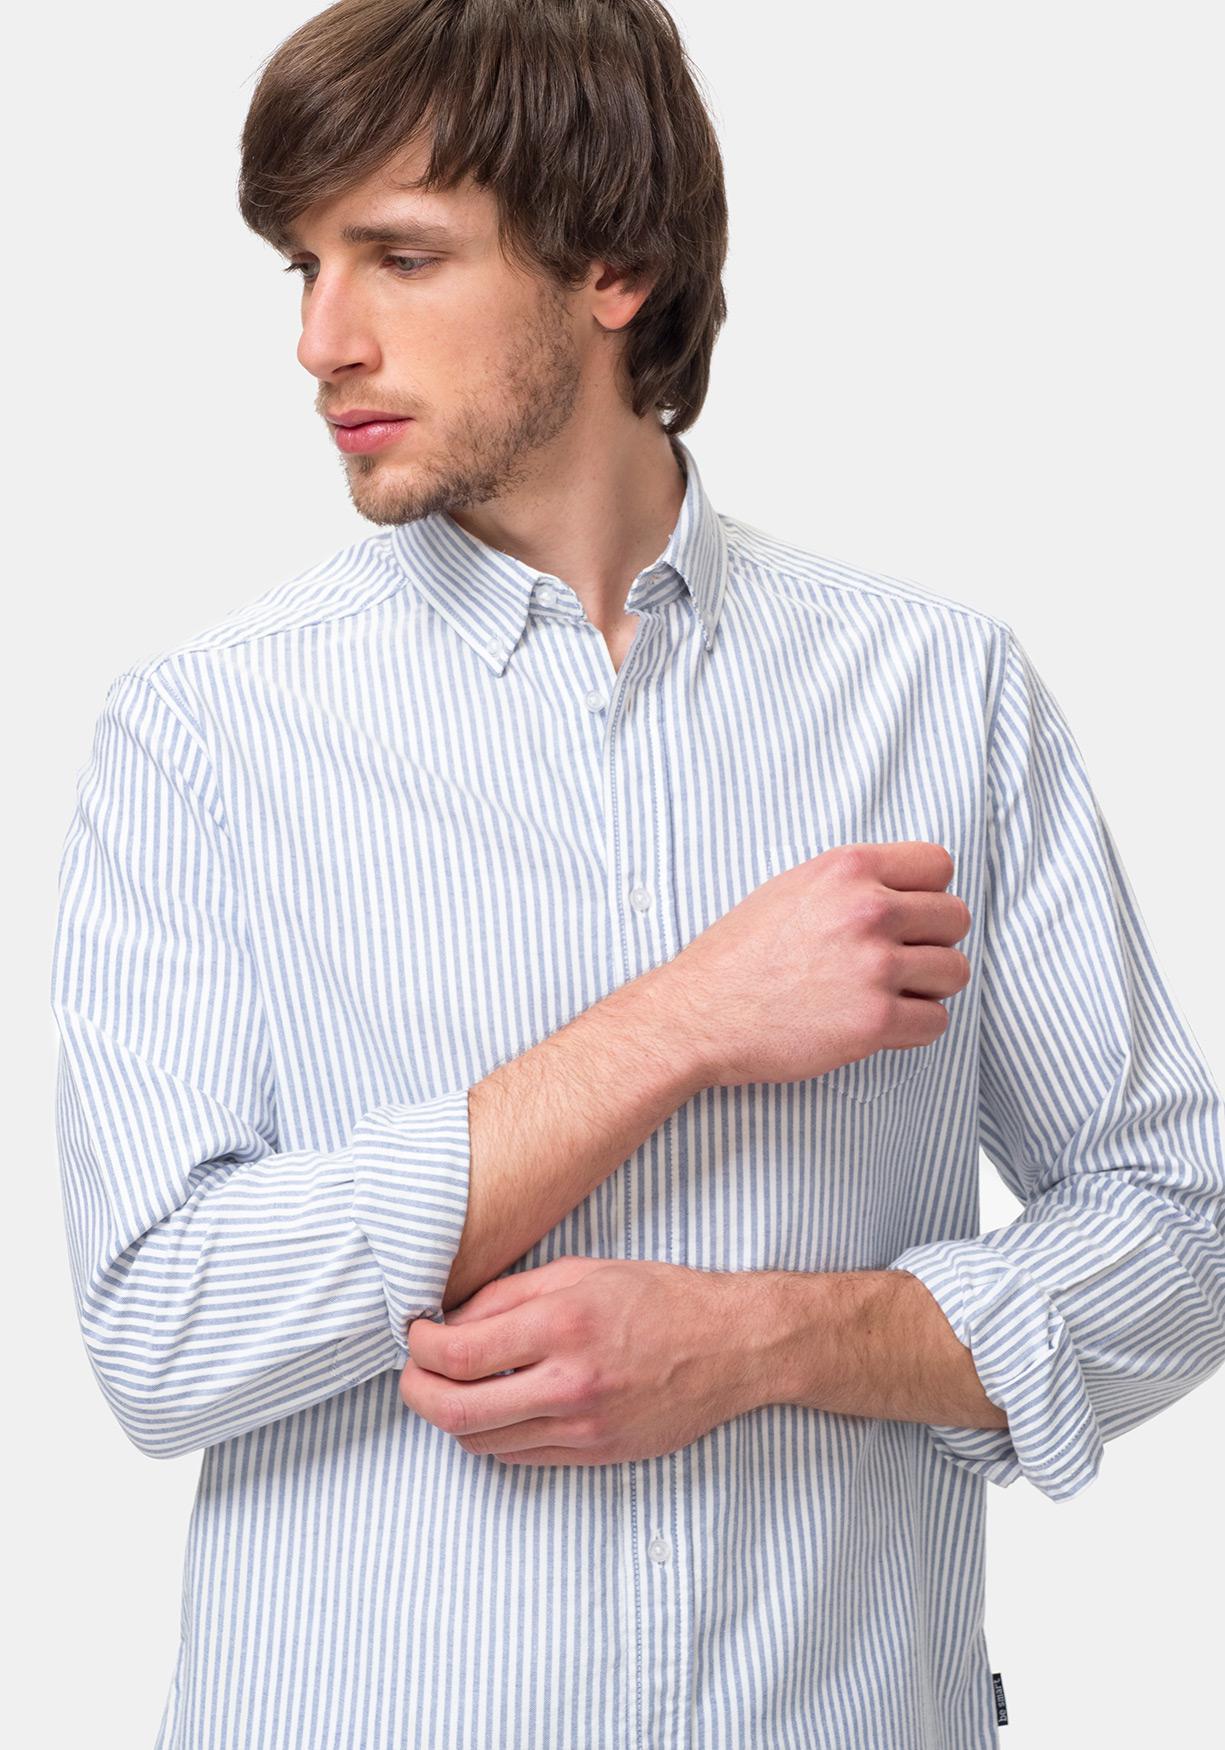 56e08fea255df Comprar Camisa de rayas manga larga TEX. ¡Aprovéchate de nuestros ...